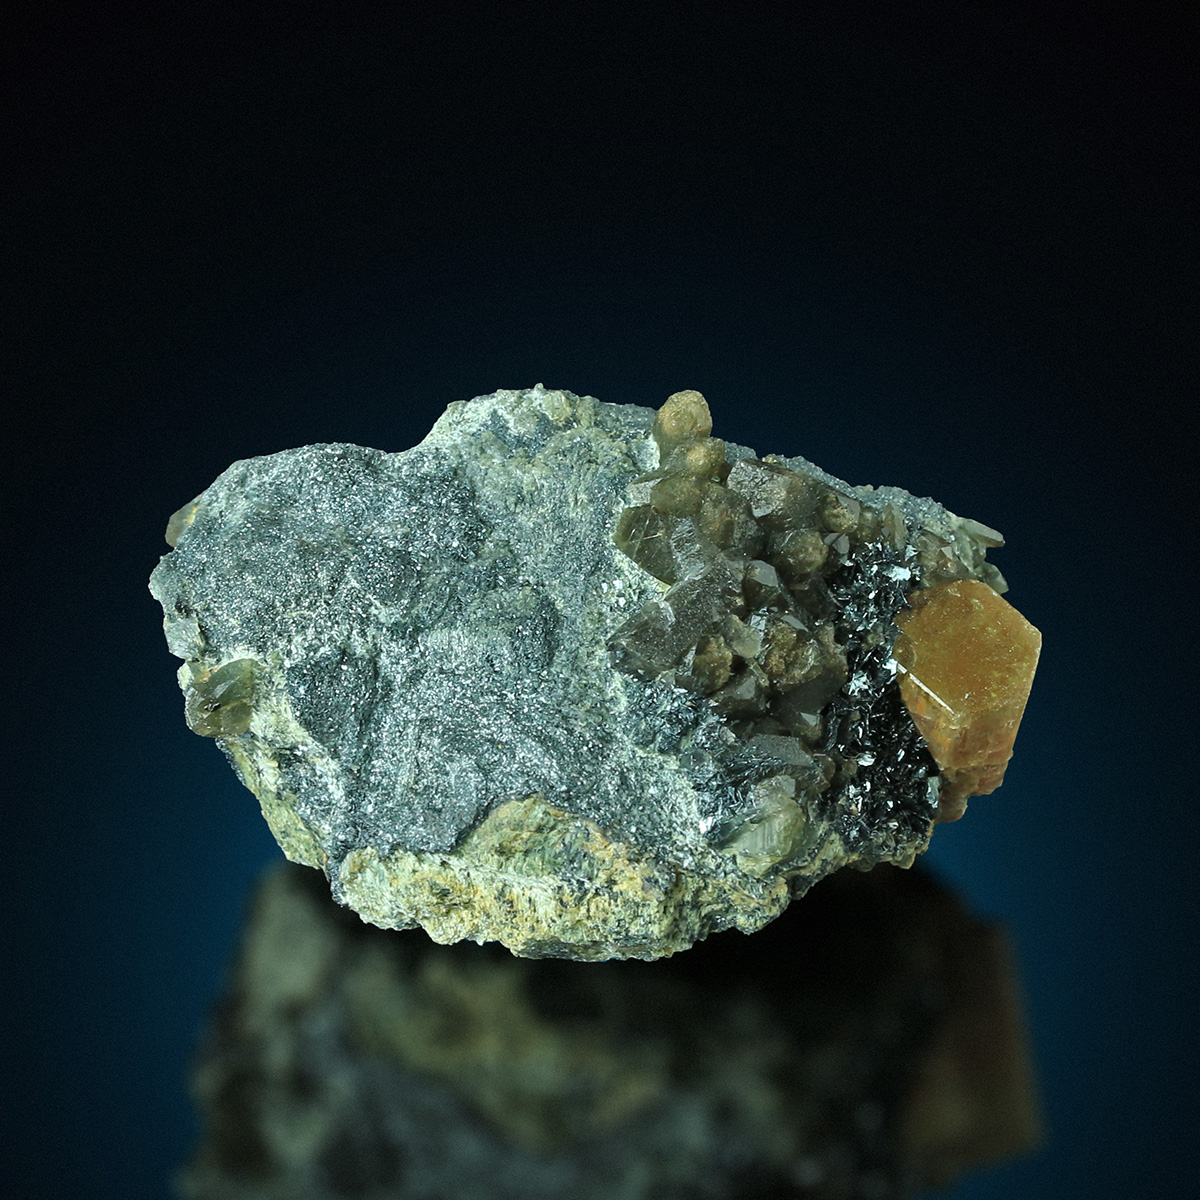 Apatite Hematite Quartz & Actinolite Psm Pyroxene Group